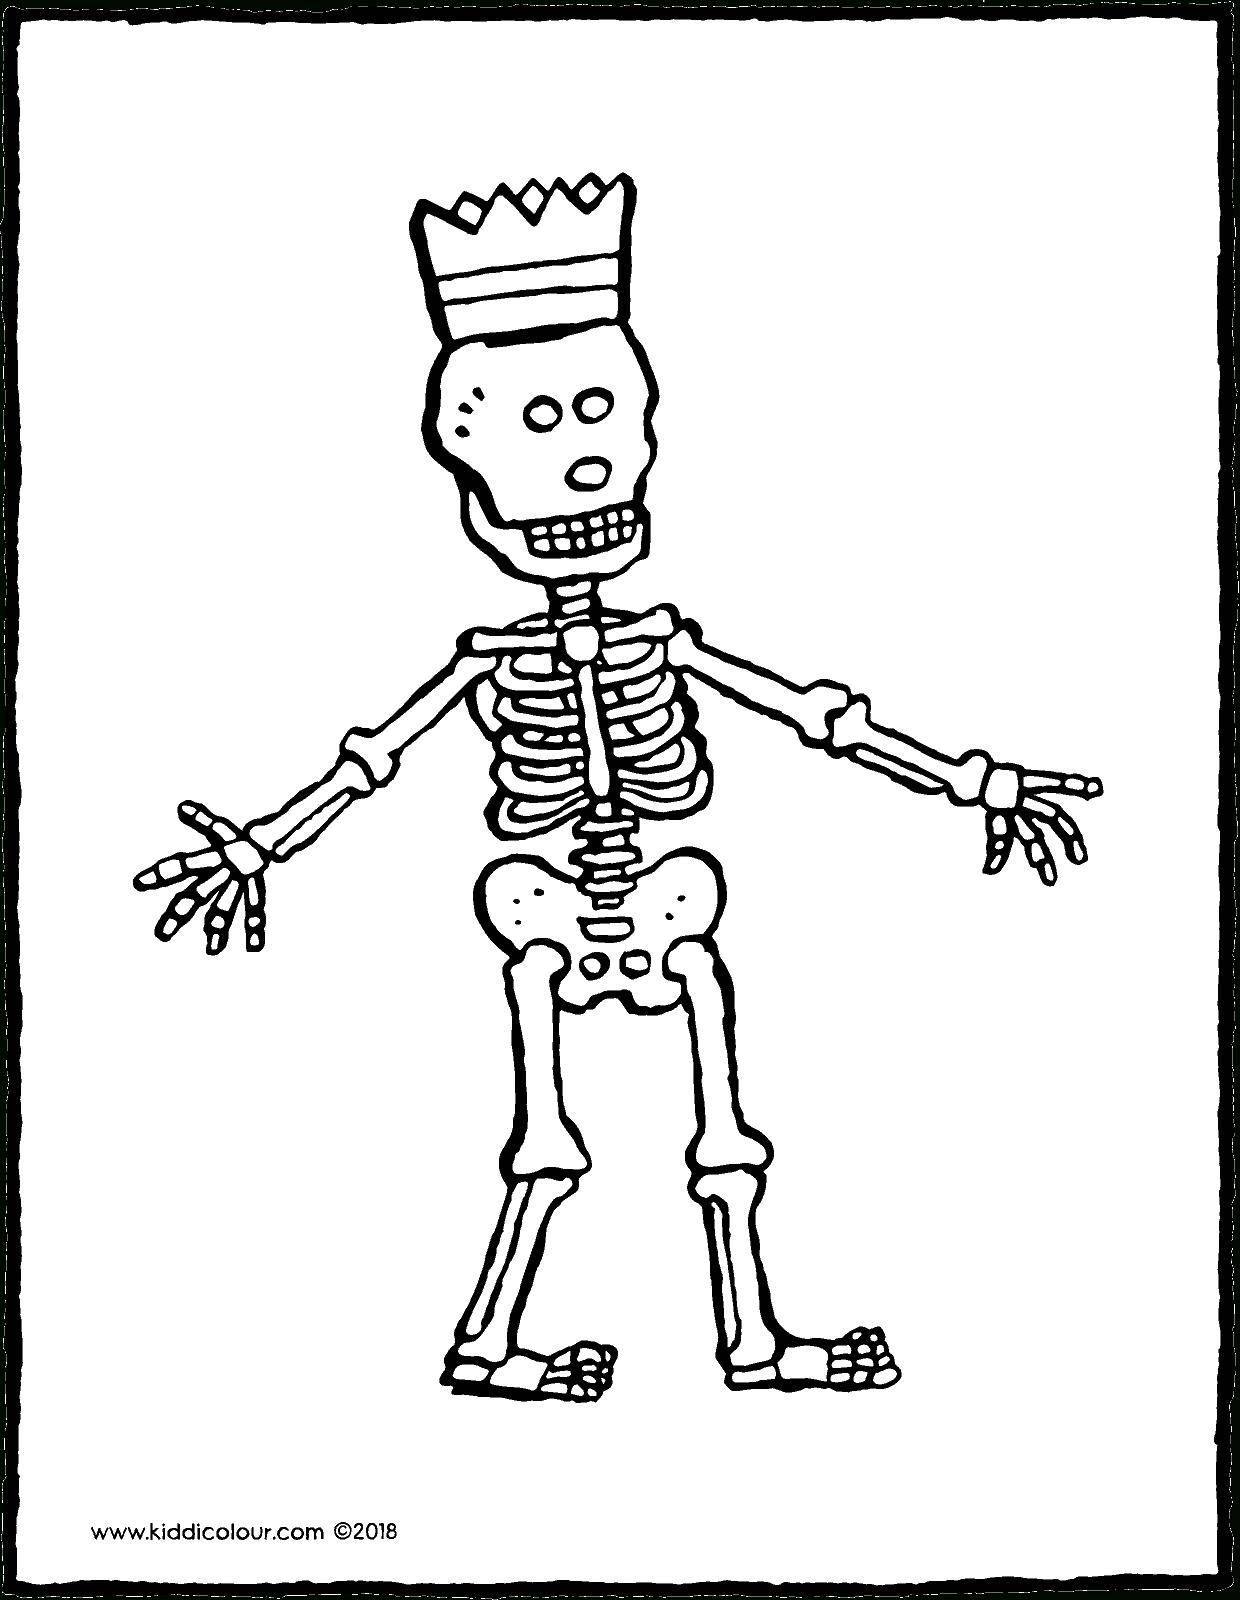 Skelett - Kiddimalseite ganzes Skelett Ausdrucken